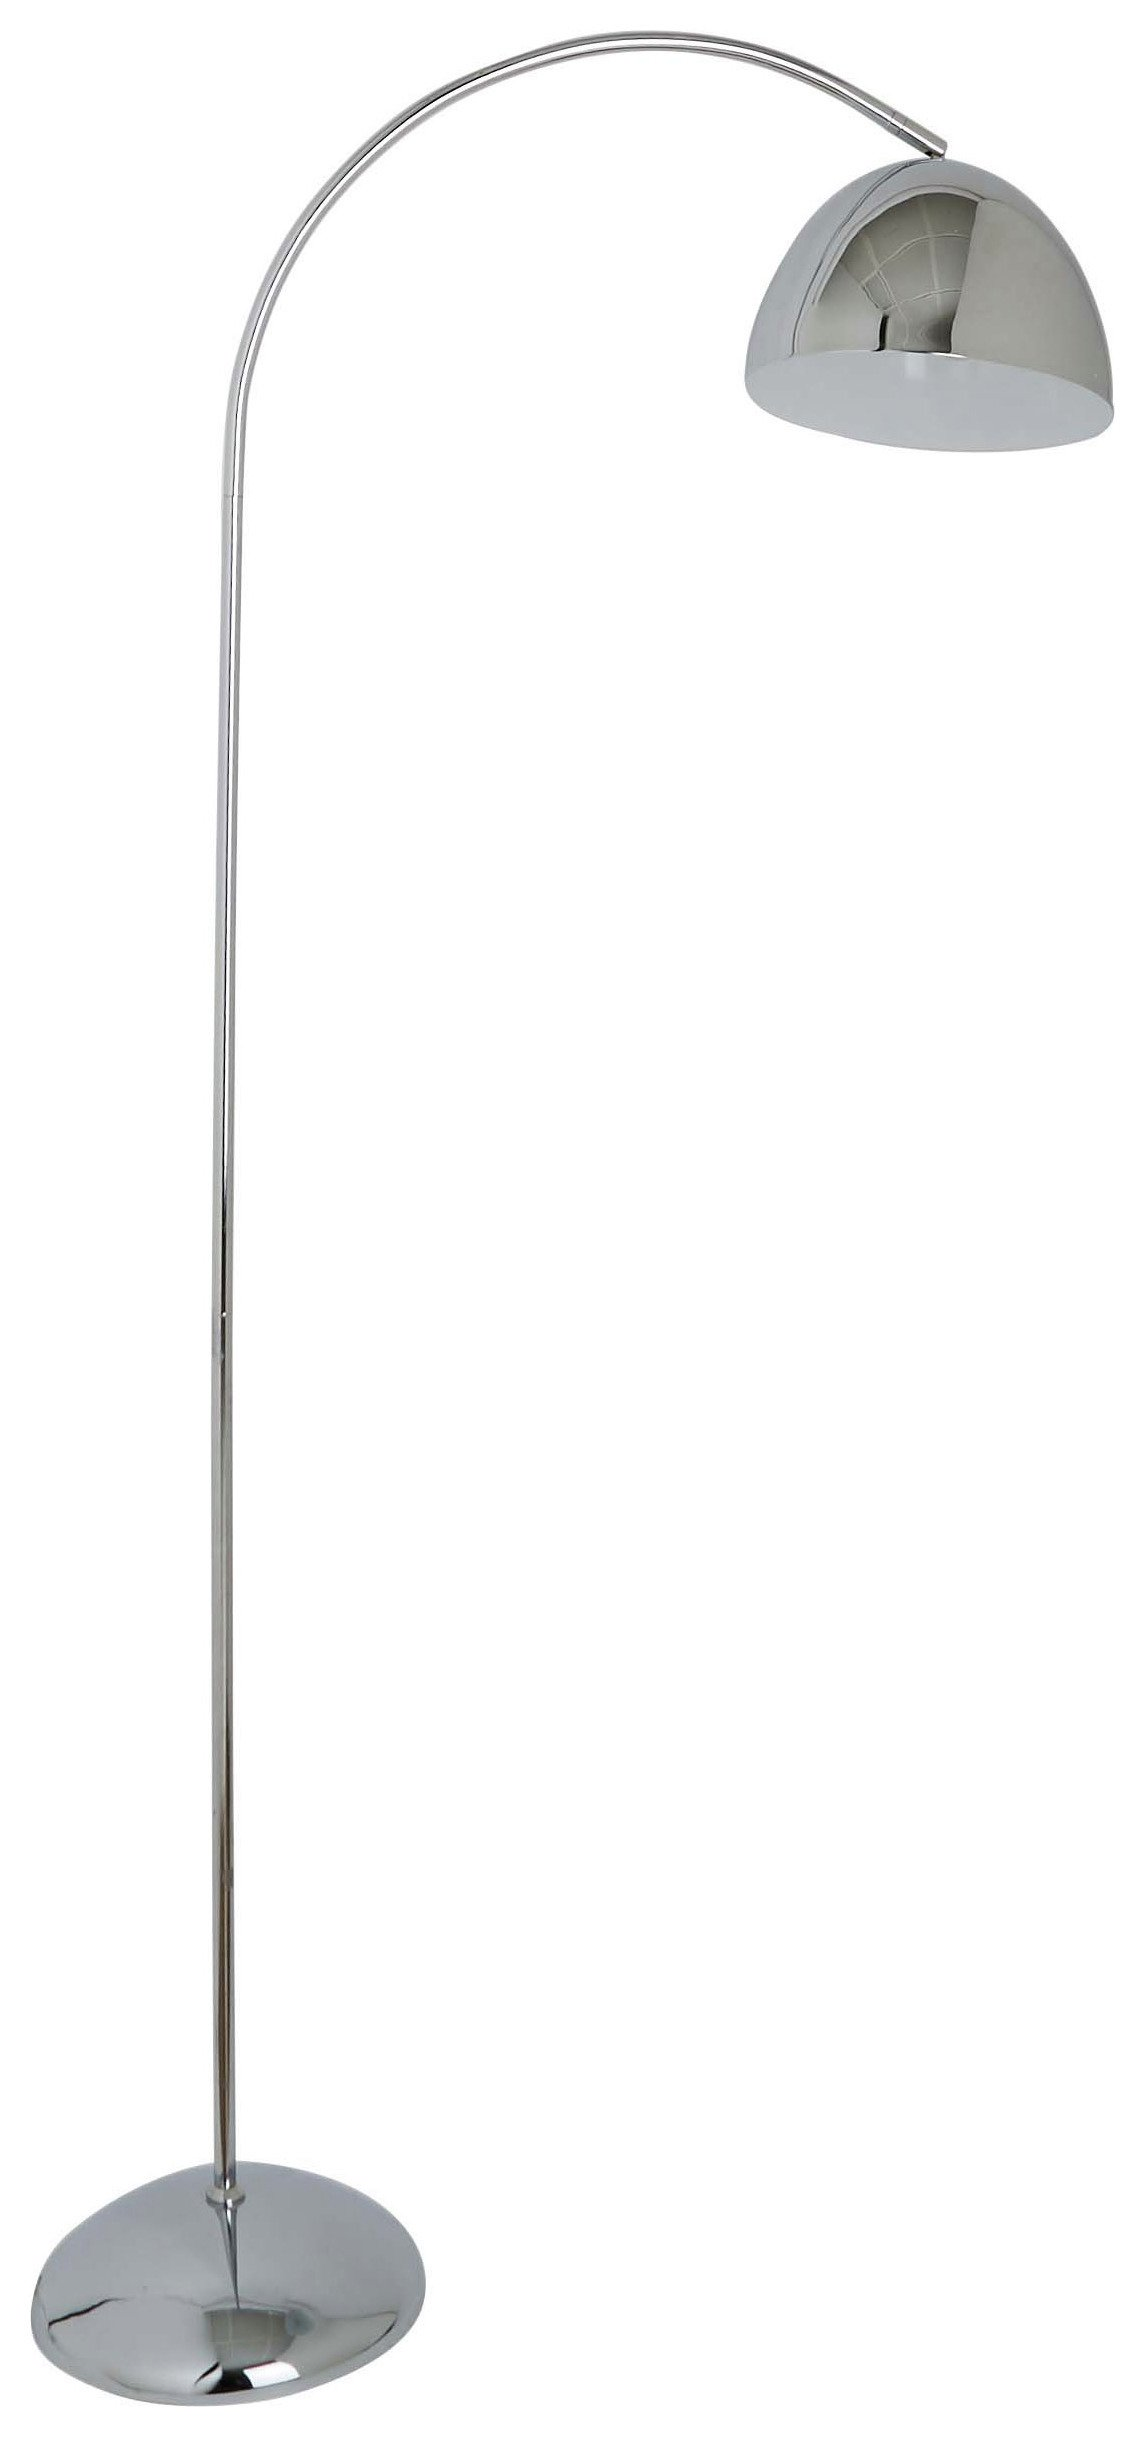 Image of Habitat Hardy Floor Lamp - Chrome